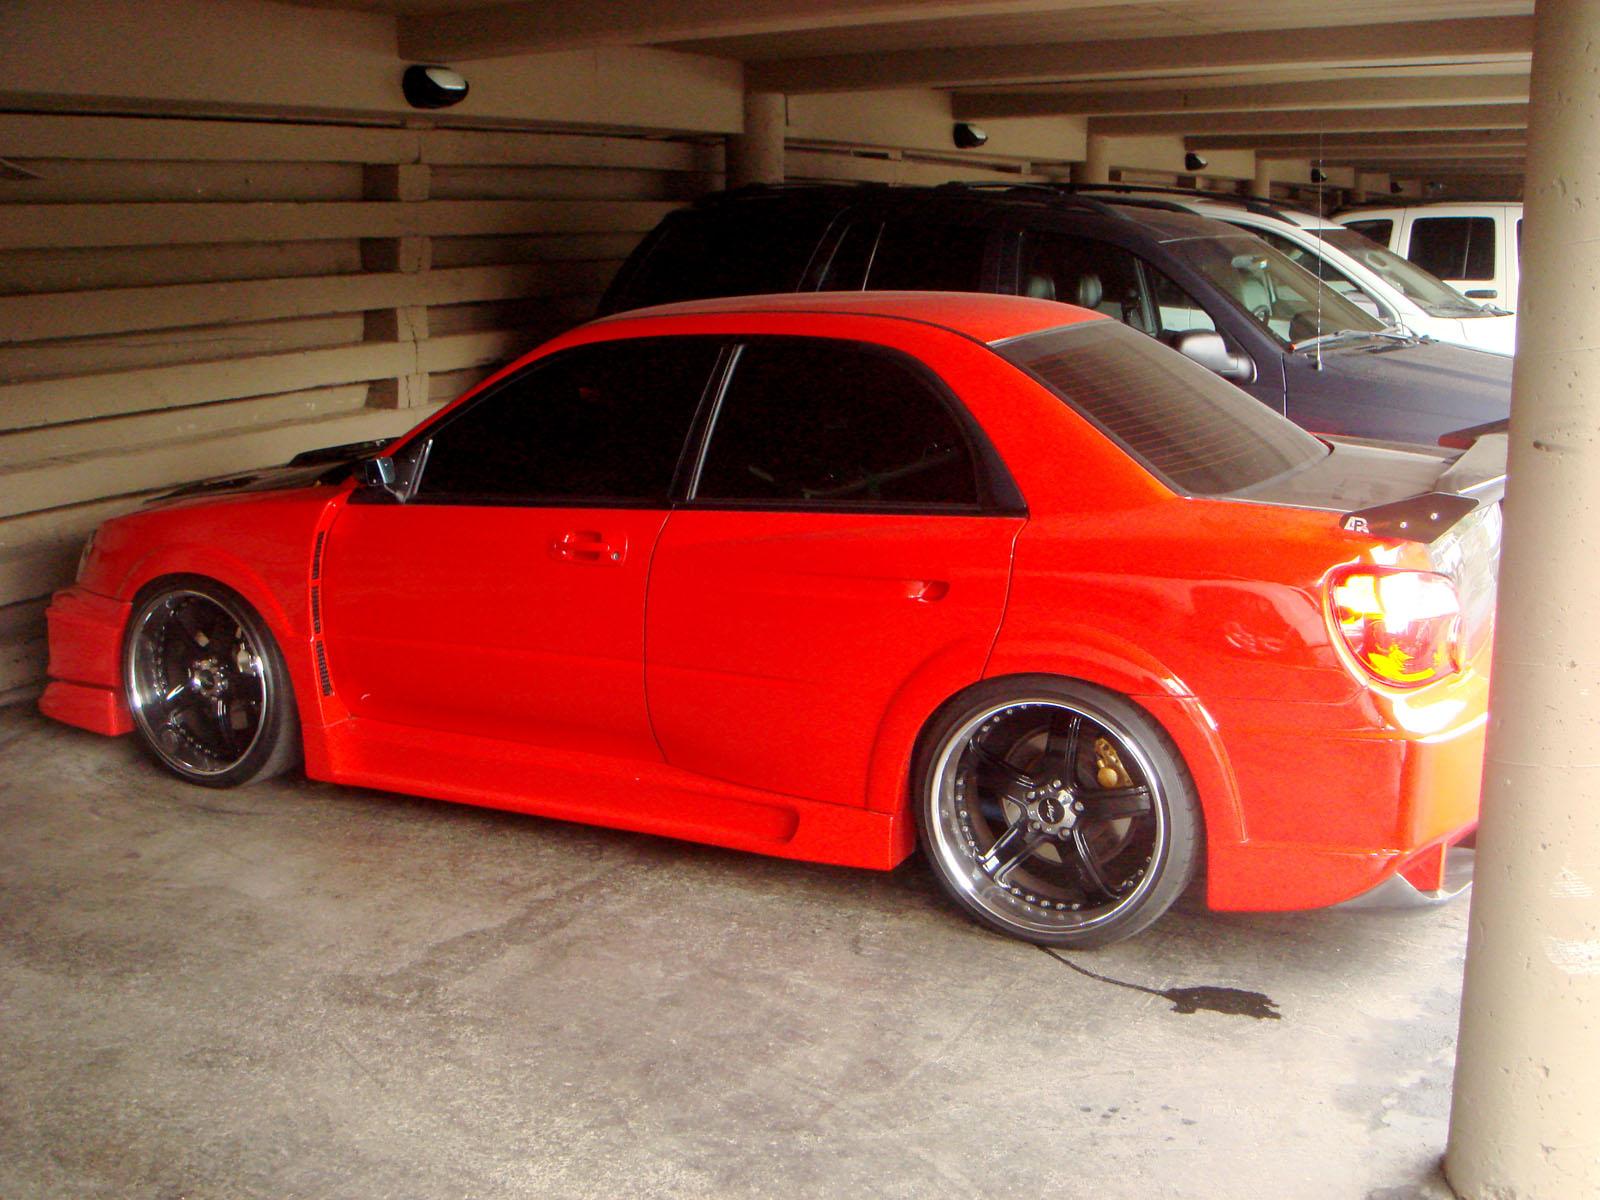 2004 Subaru Widebody Impreza STi For Sale